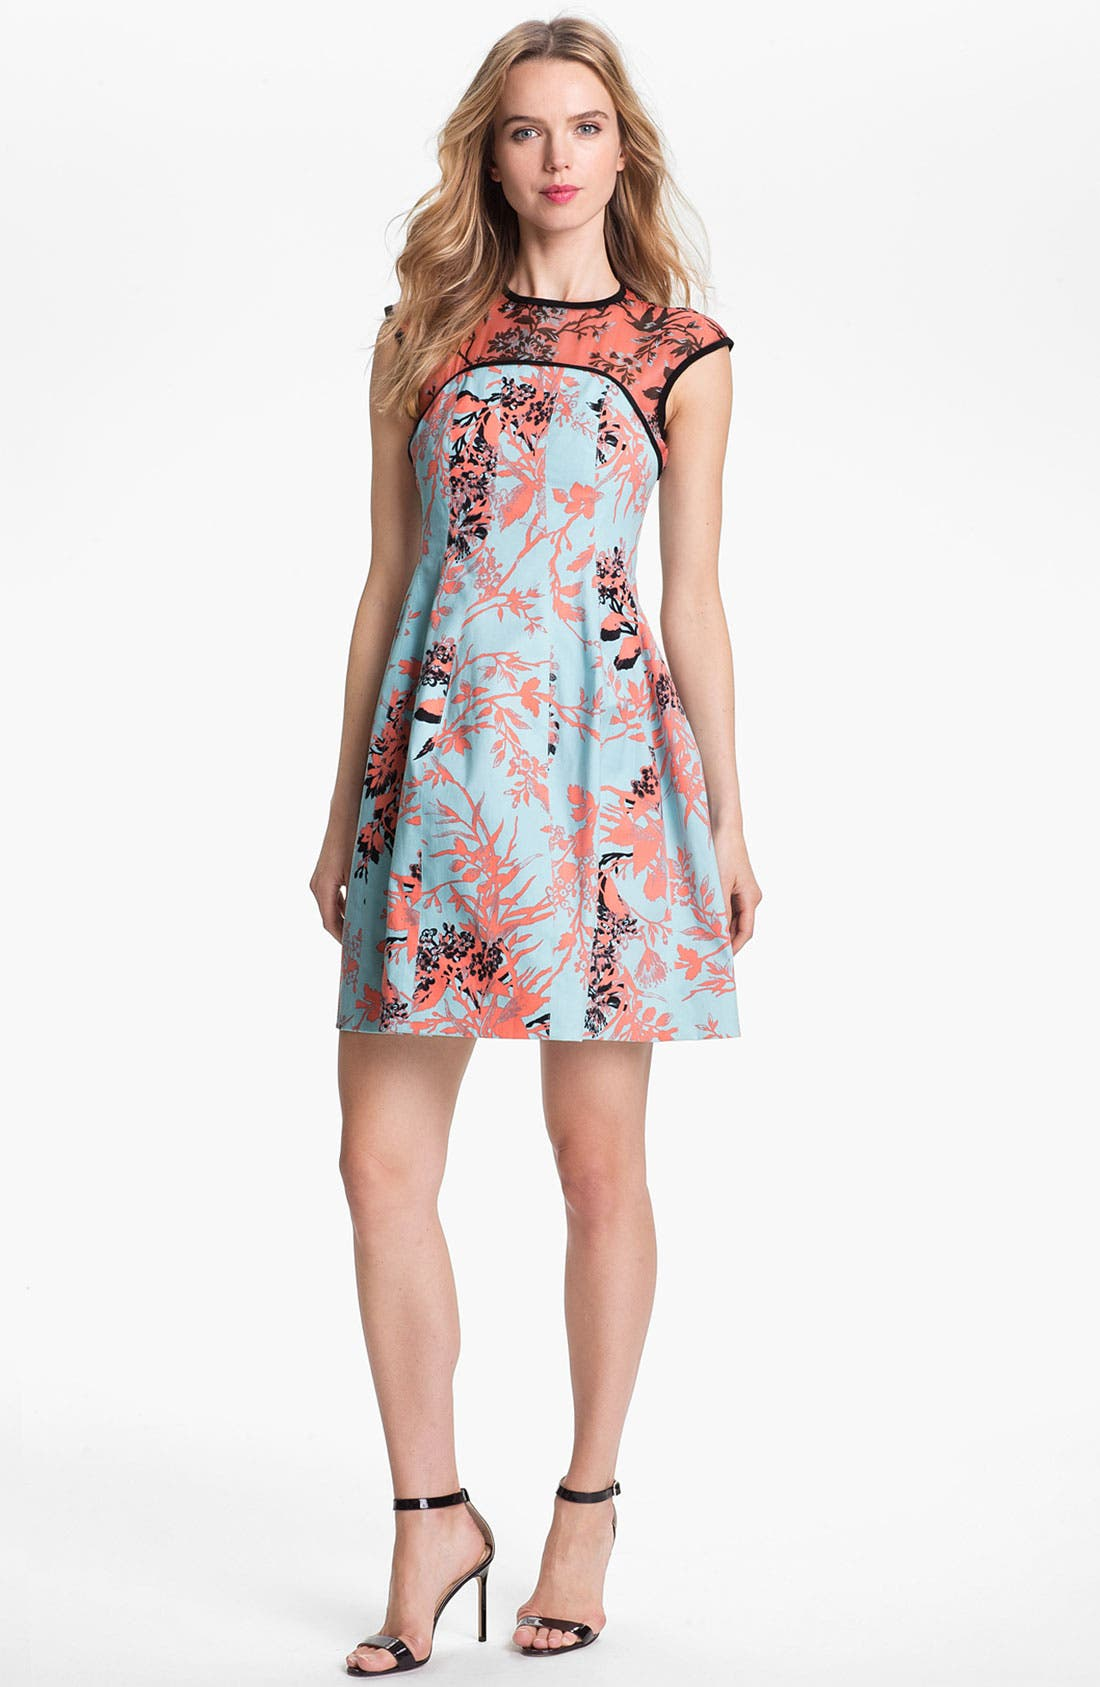 Main Image - Nanette Lepore 'Club Mix' A-Line Dress